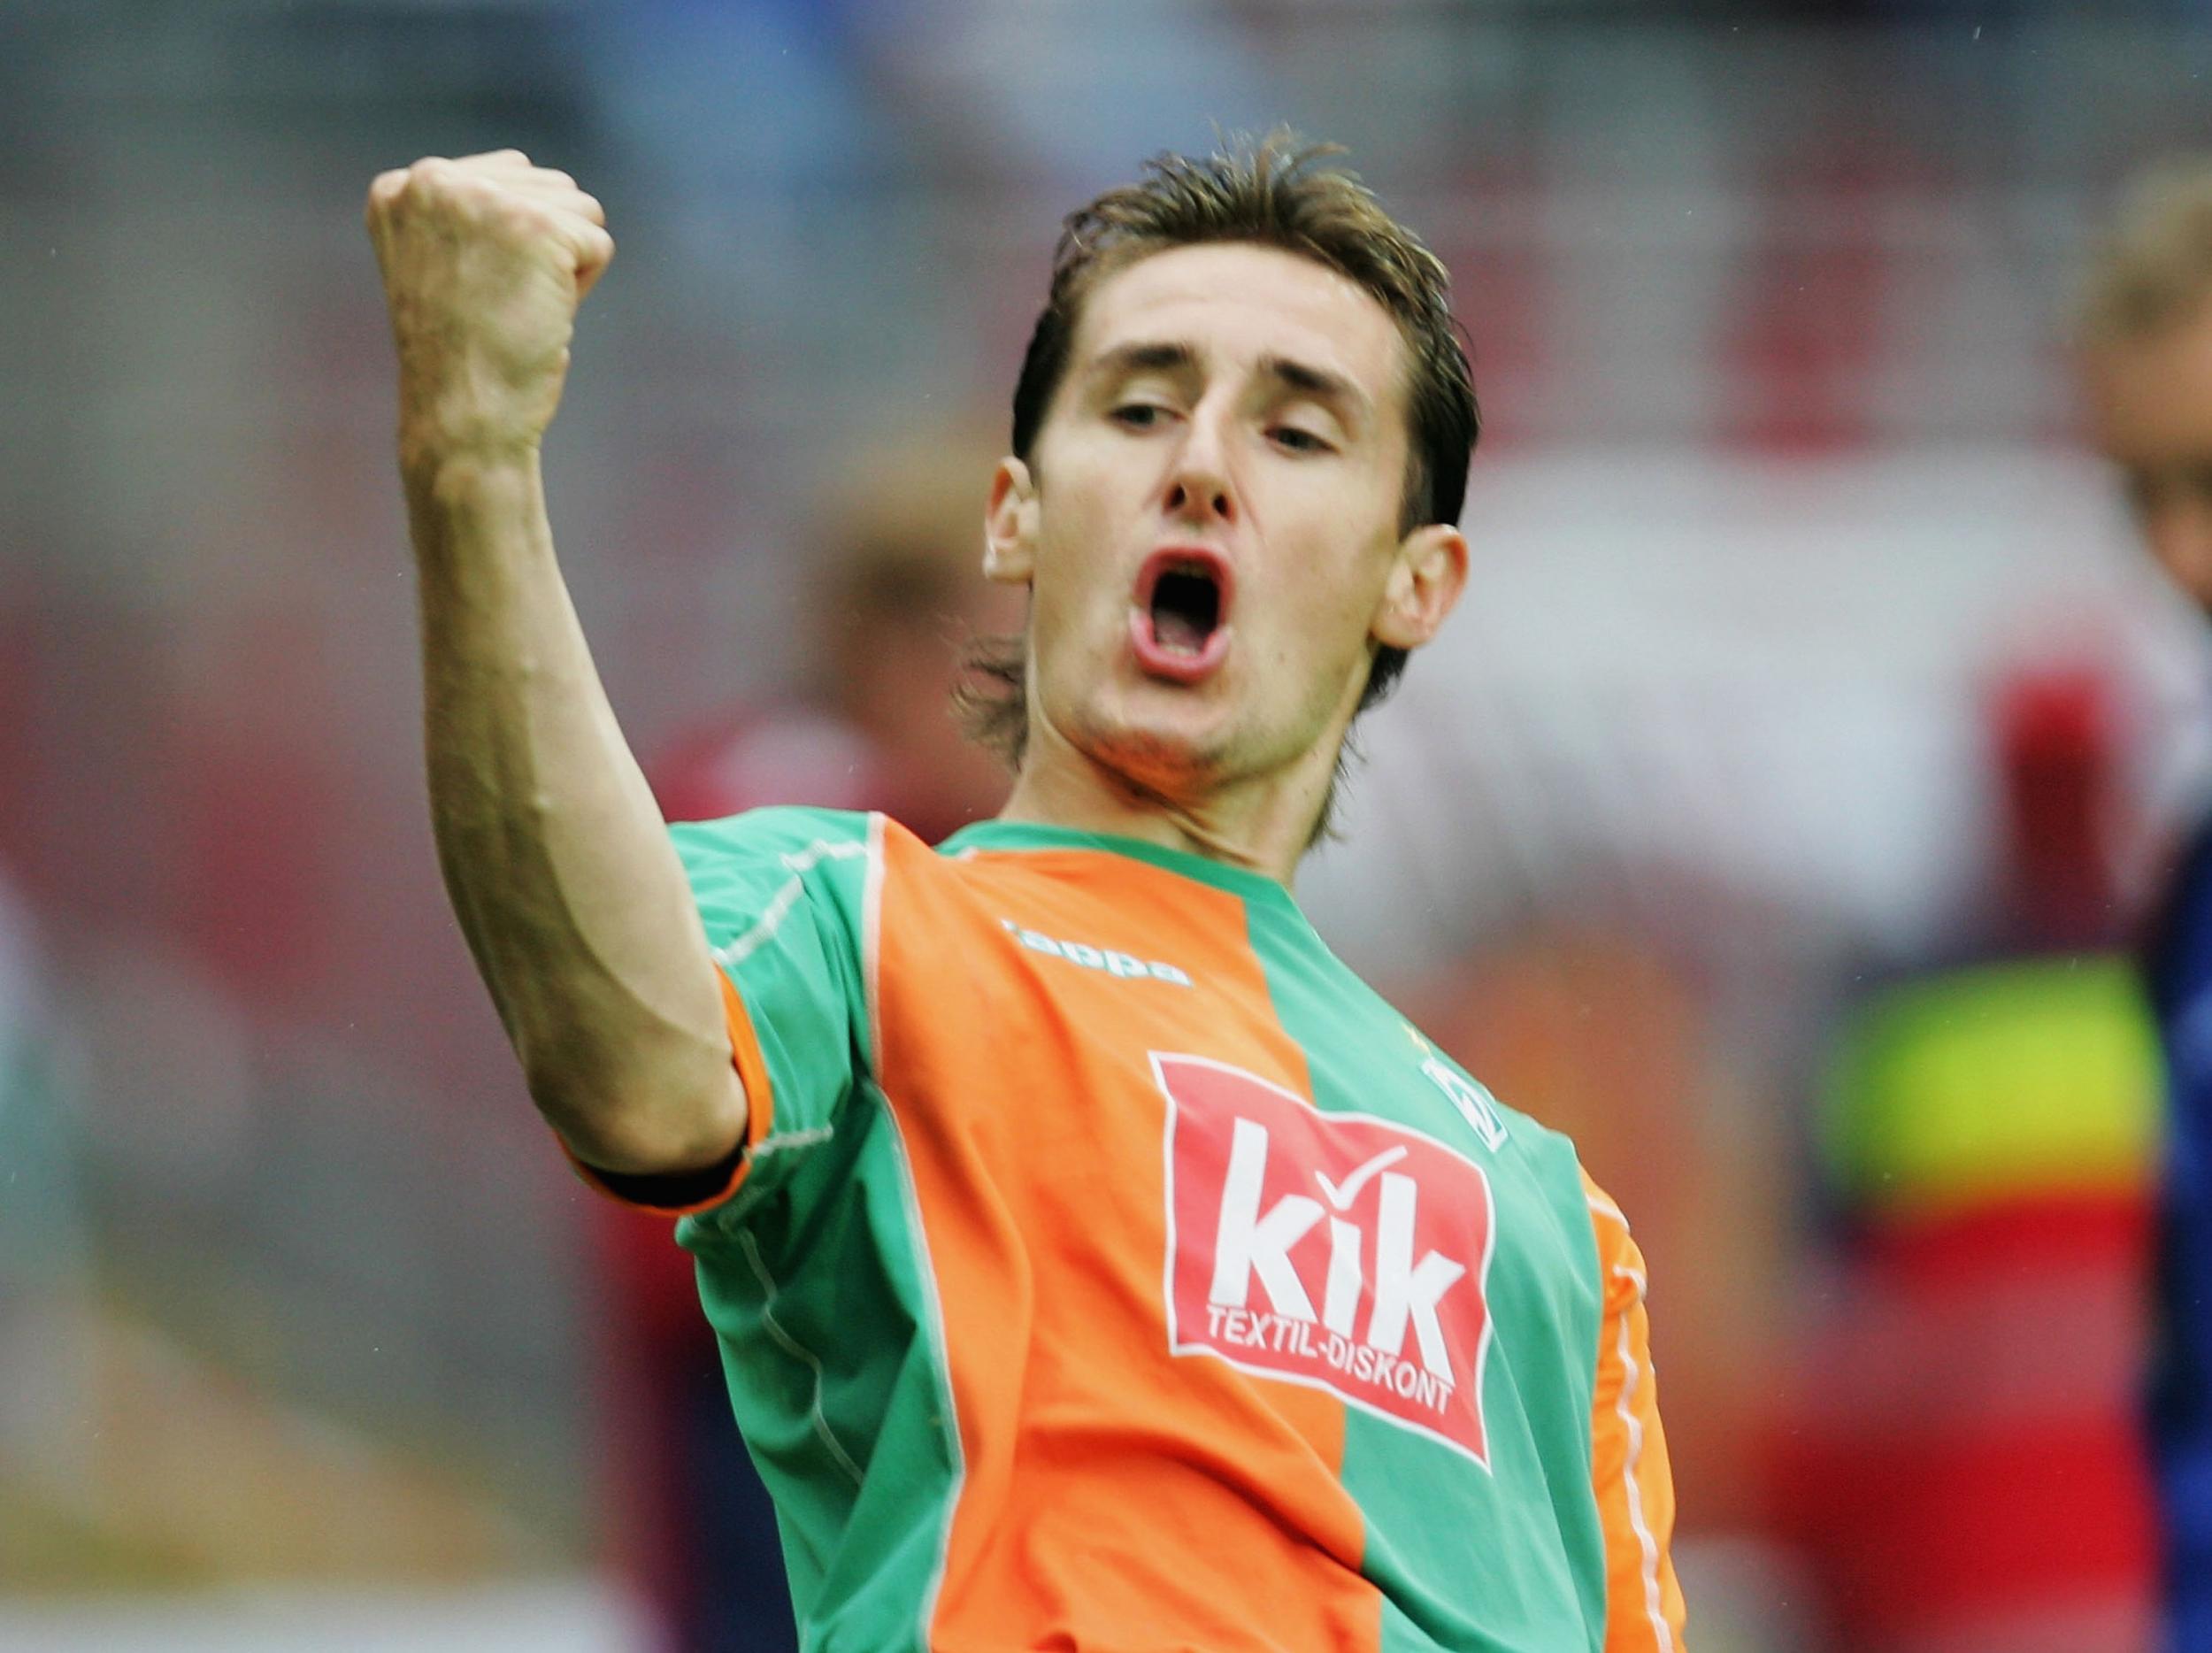 58. Miroslav Klose